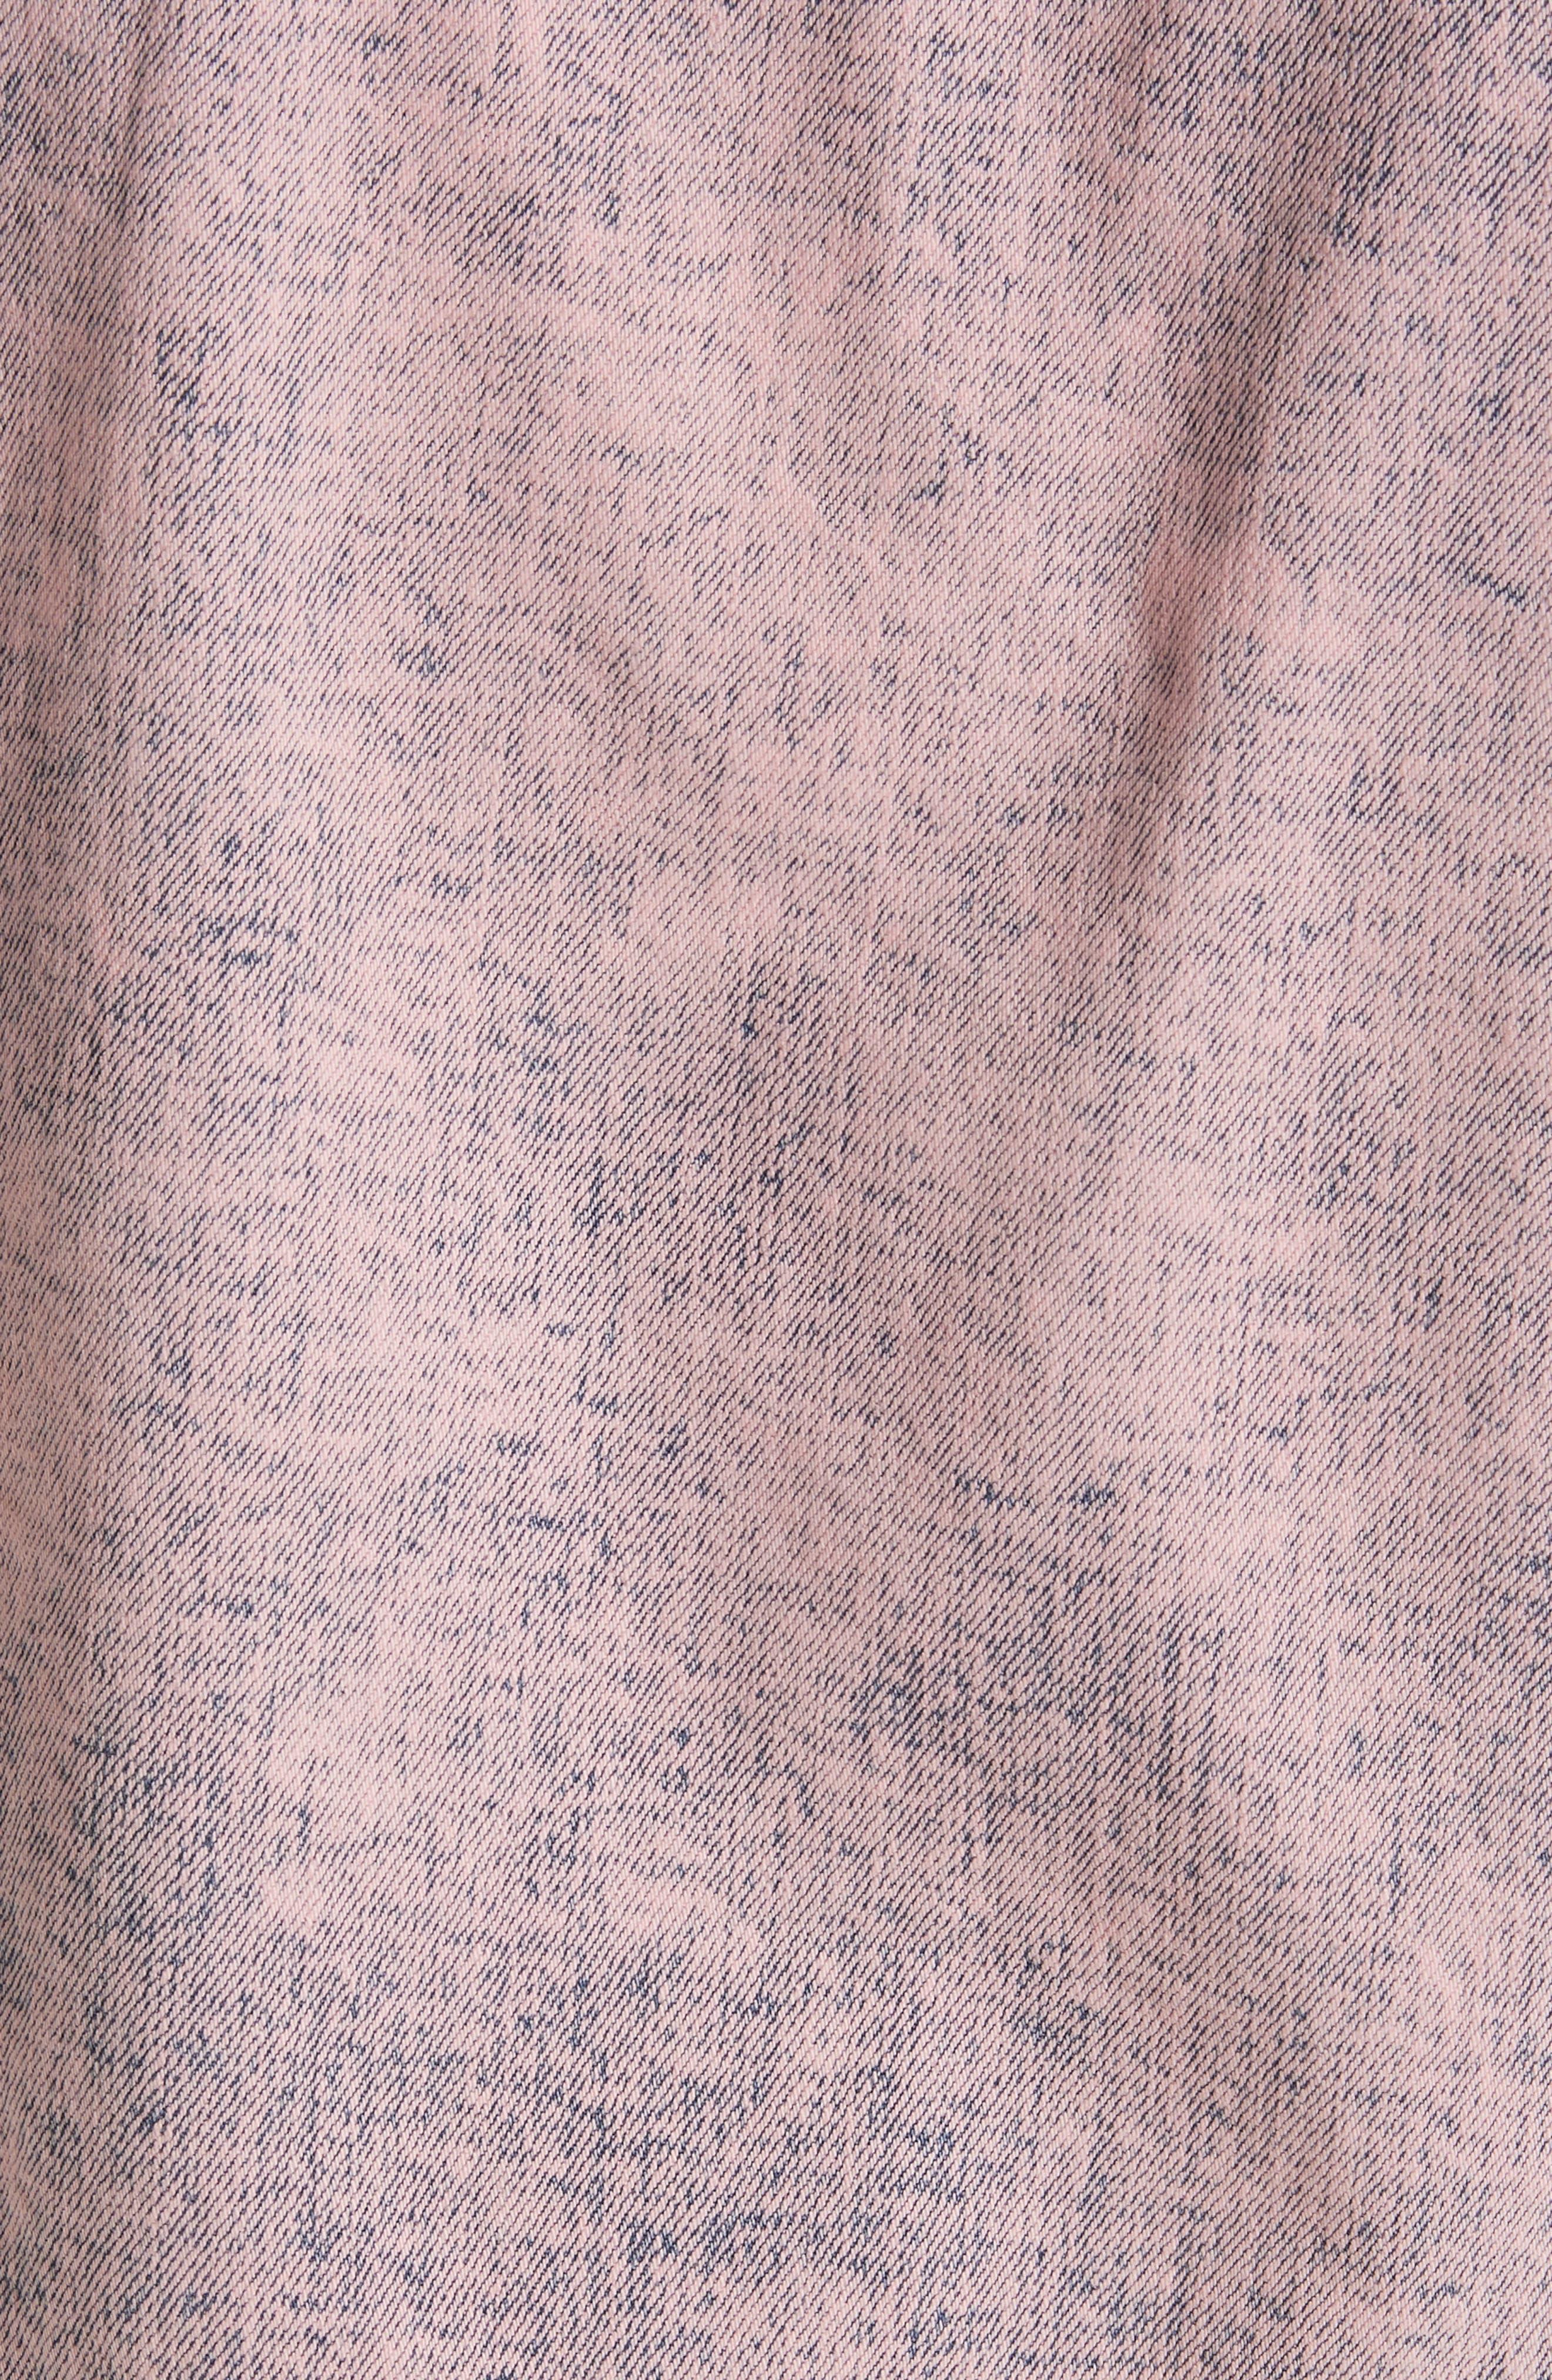 Denim Moto Jacket,                             Alternate thumbnail 5, color,                             Pink Overdyed Acid Wash